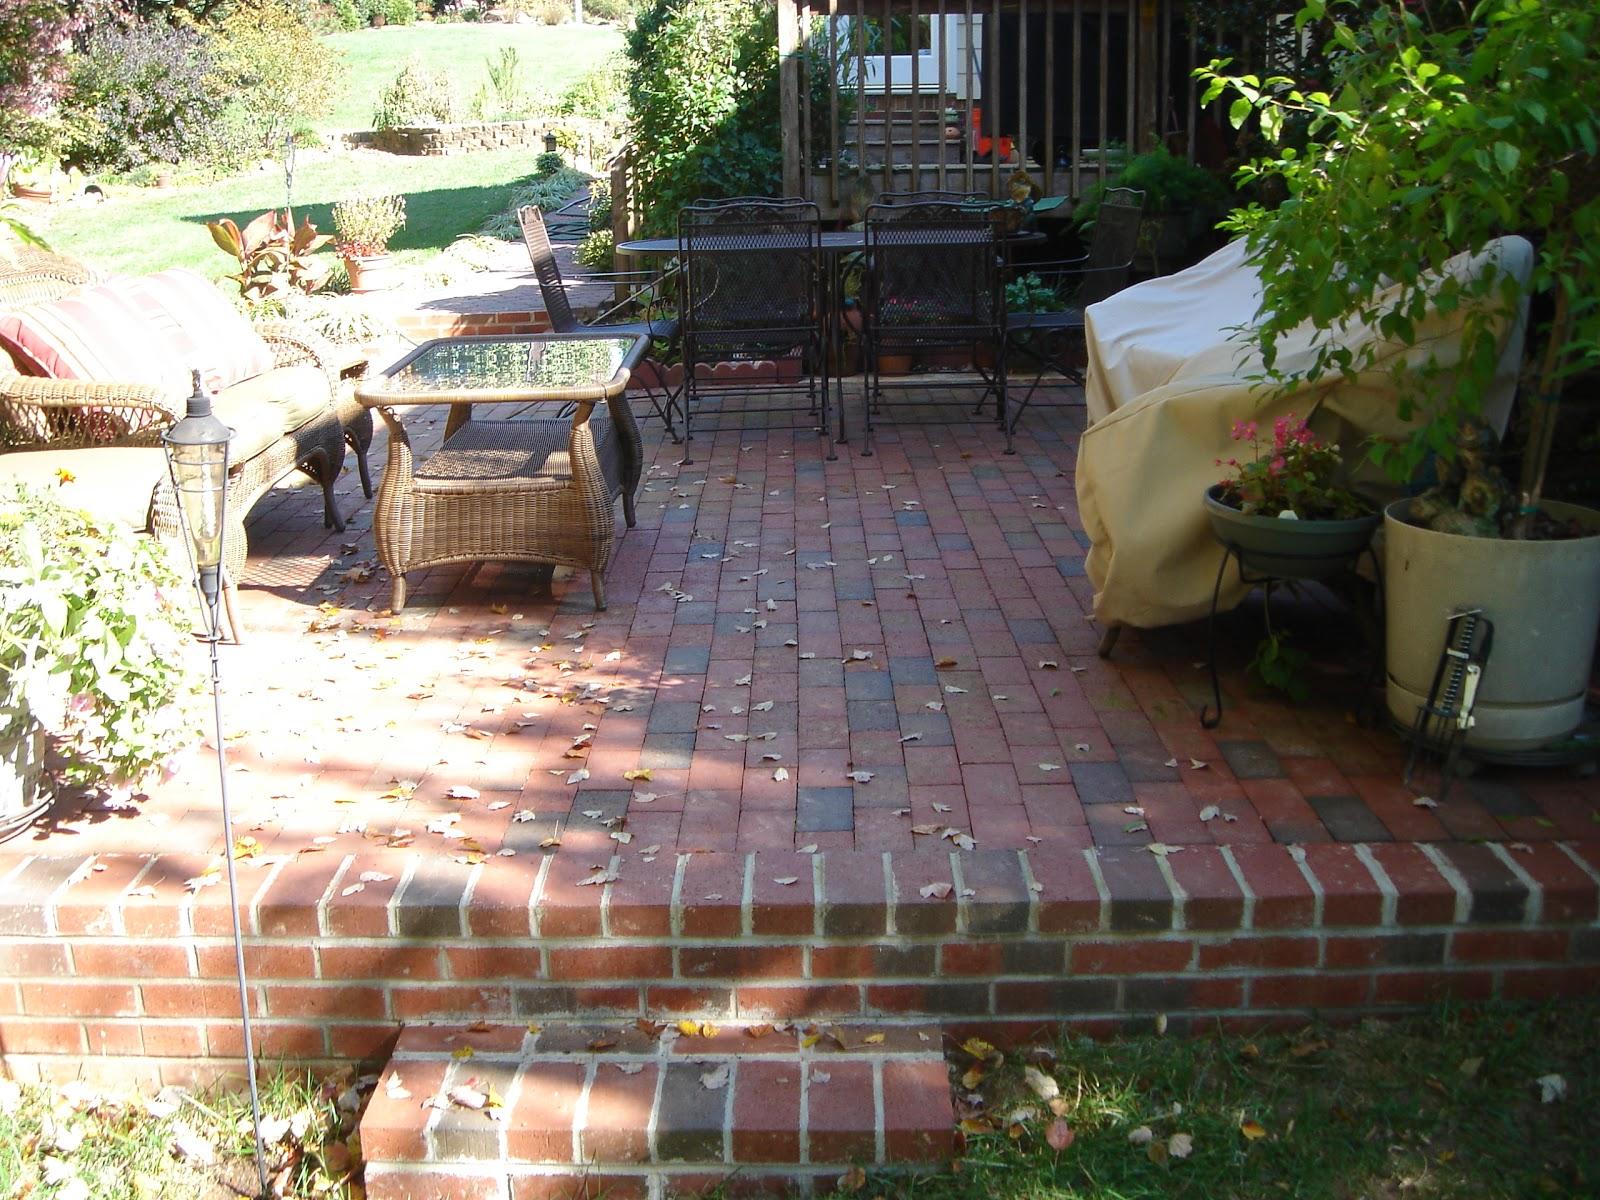 Brick Patio Ideas Landscaping Network Brick Patio Ideas Displaying ...